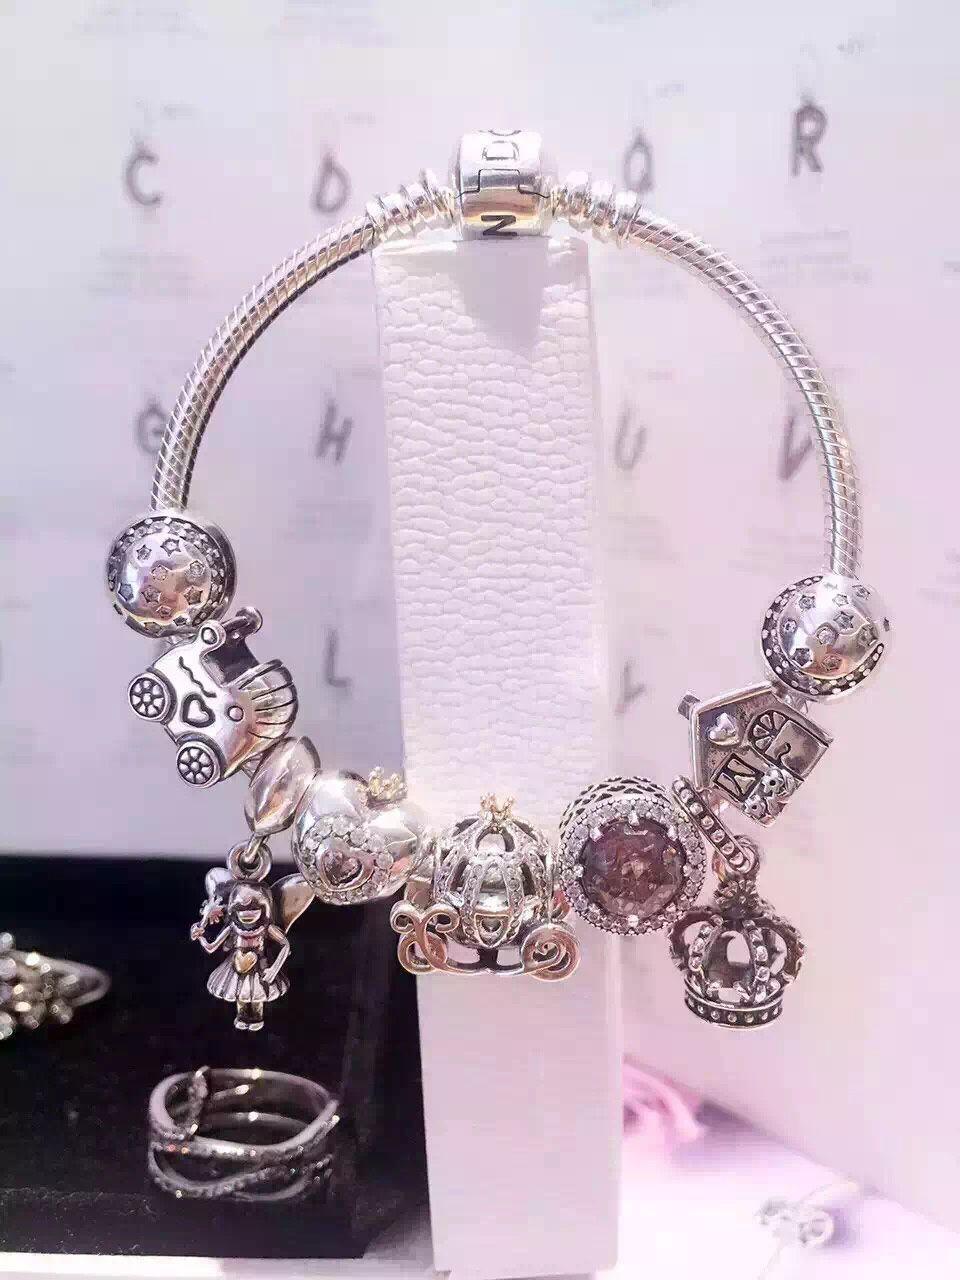 239 pandora charm bracelet pink hot sale